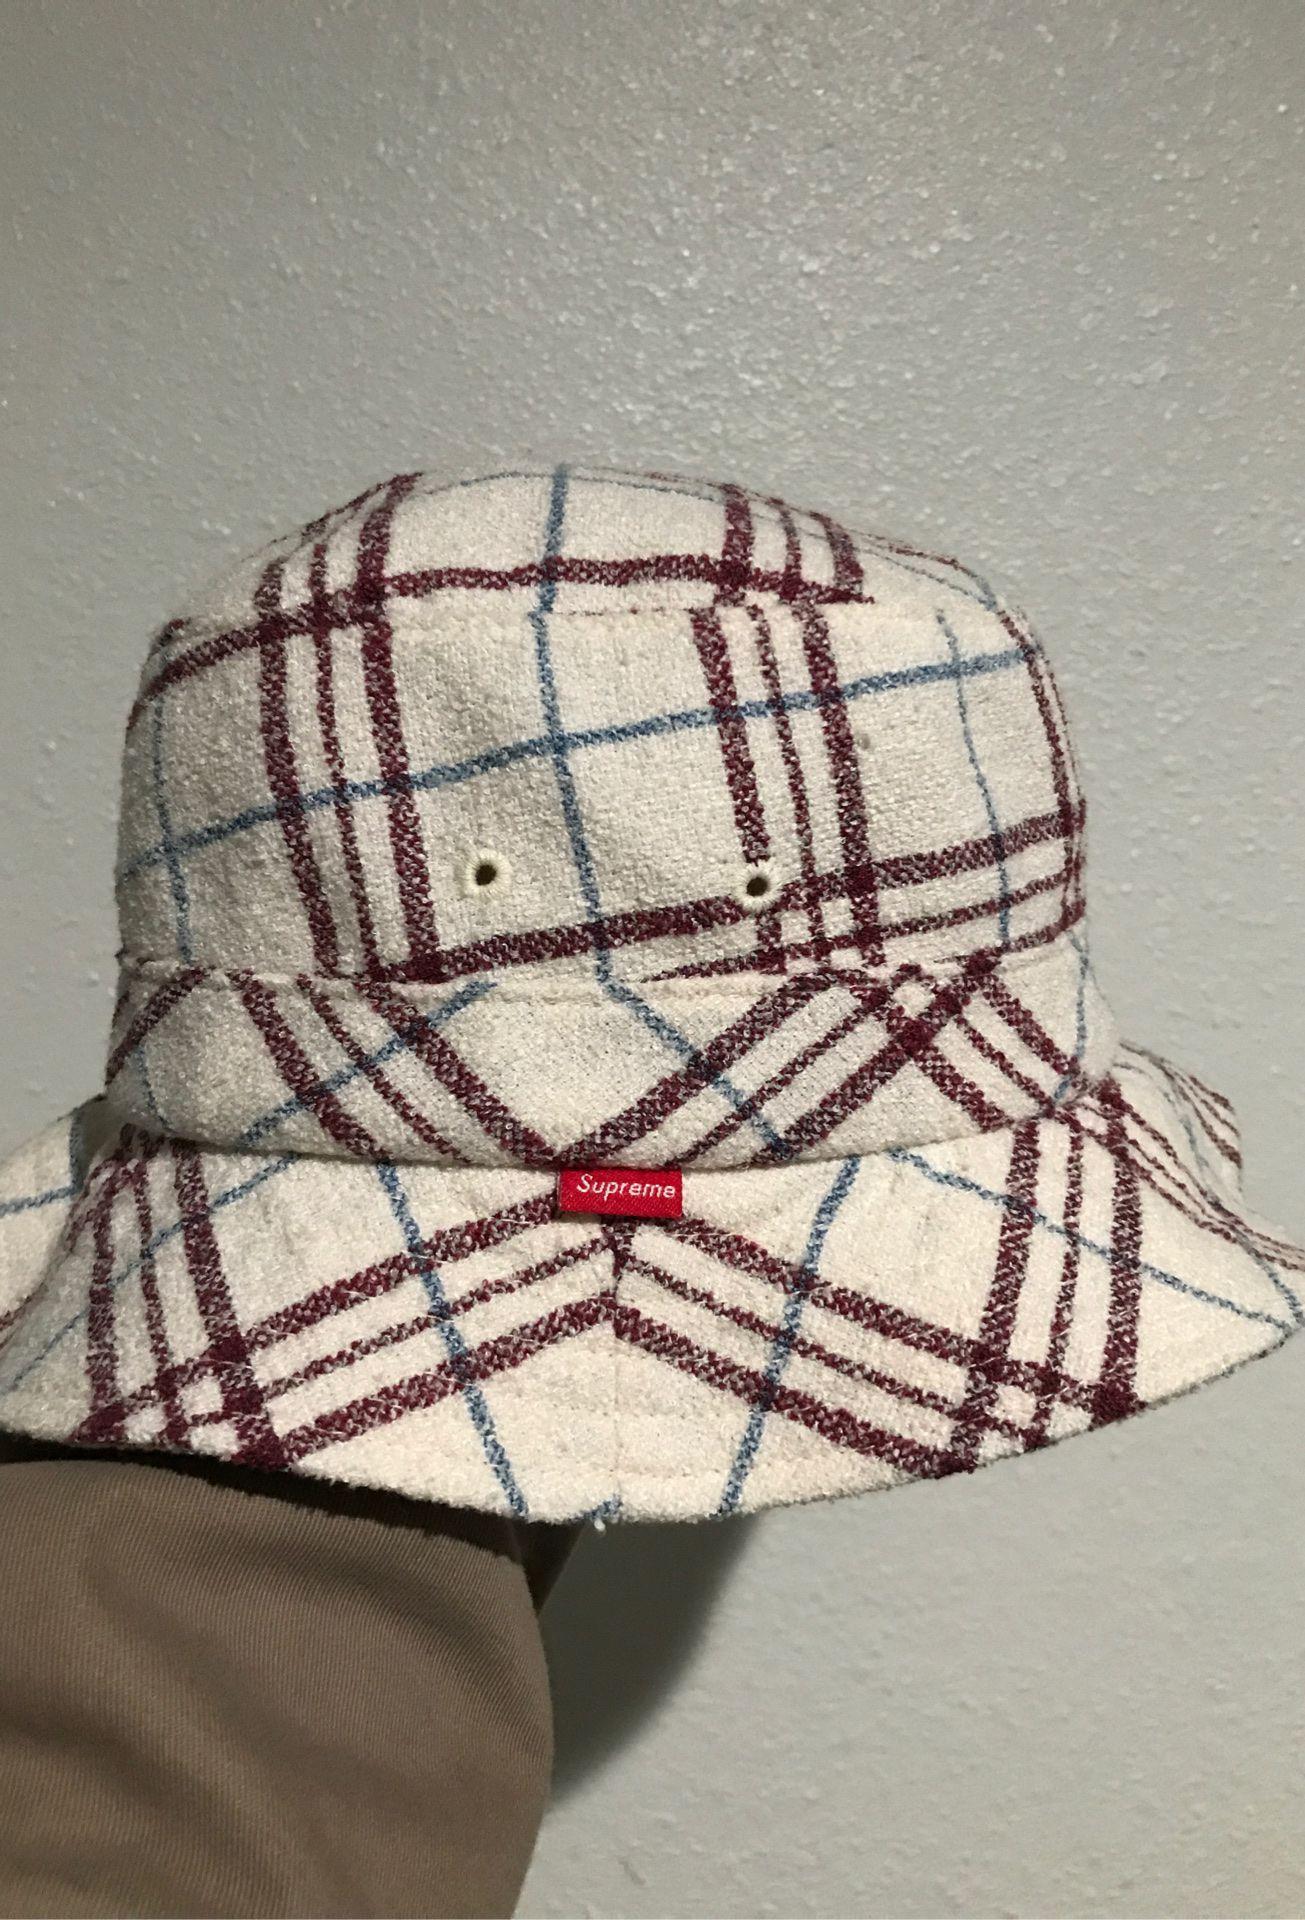 Supreme bucket hat vintage rare